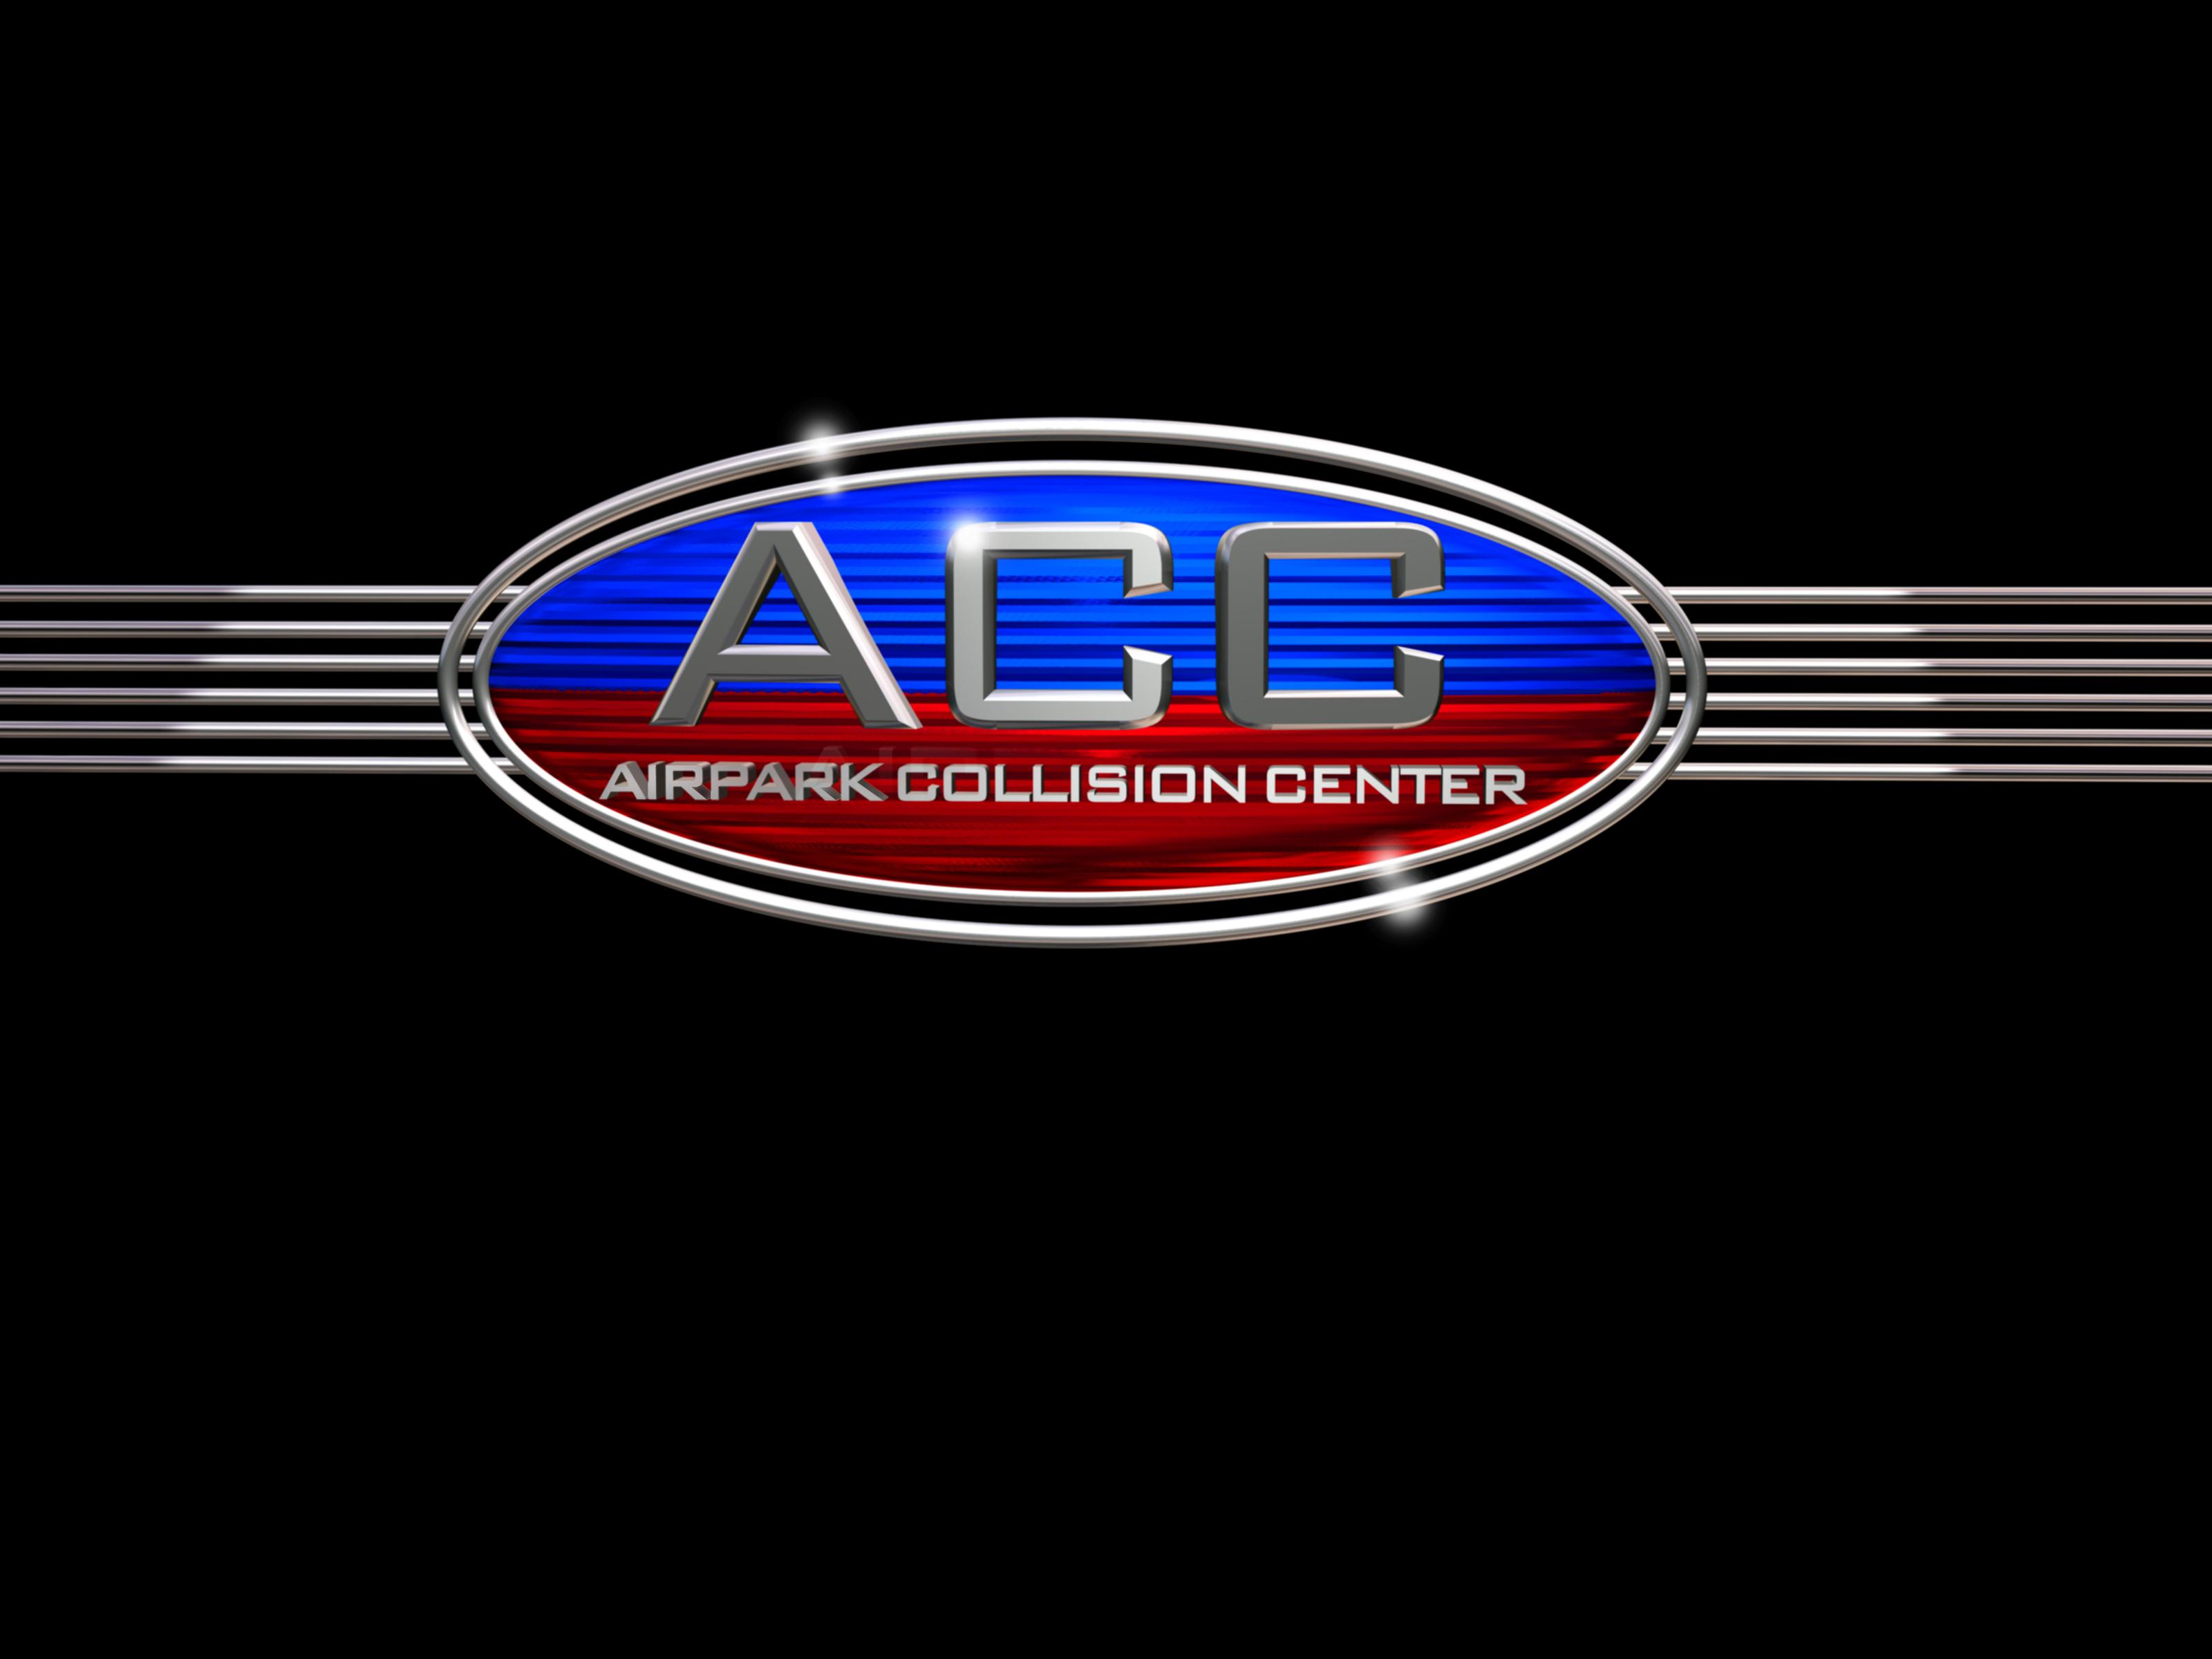 Airpark Collision Center LLC